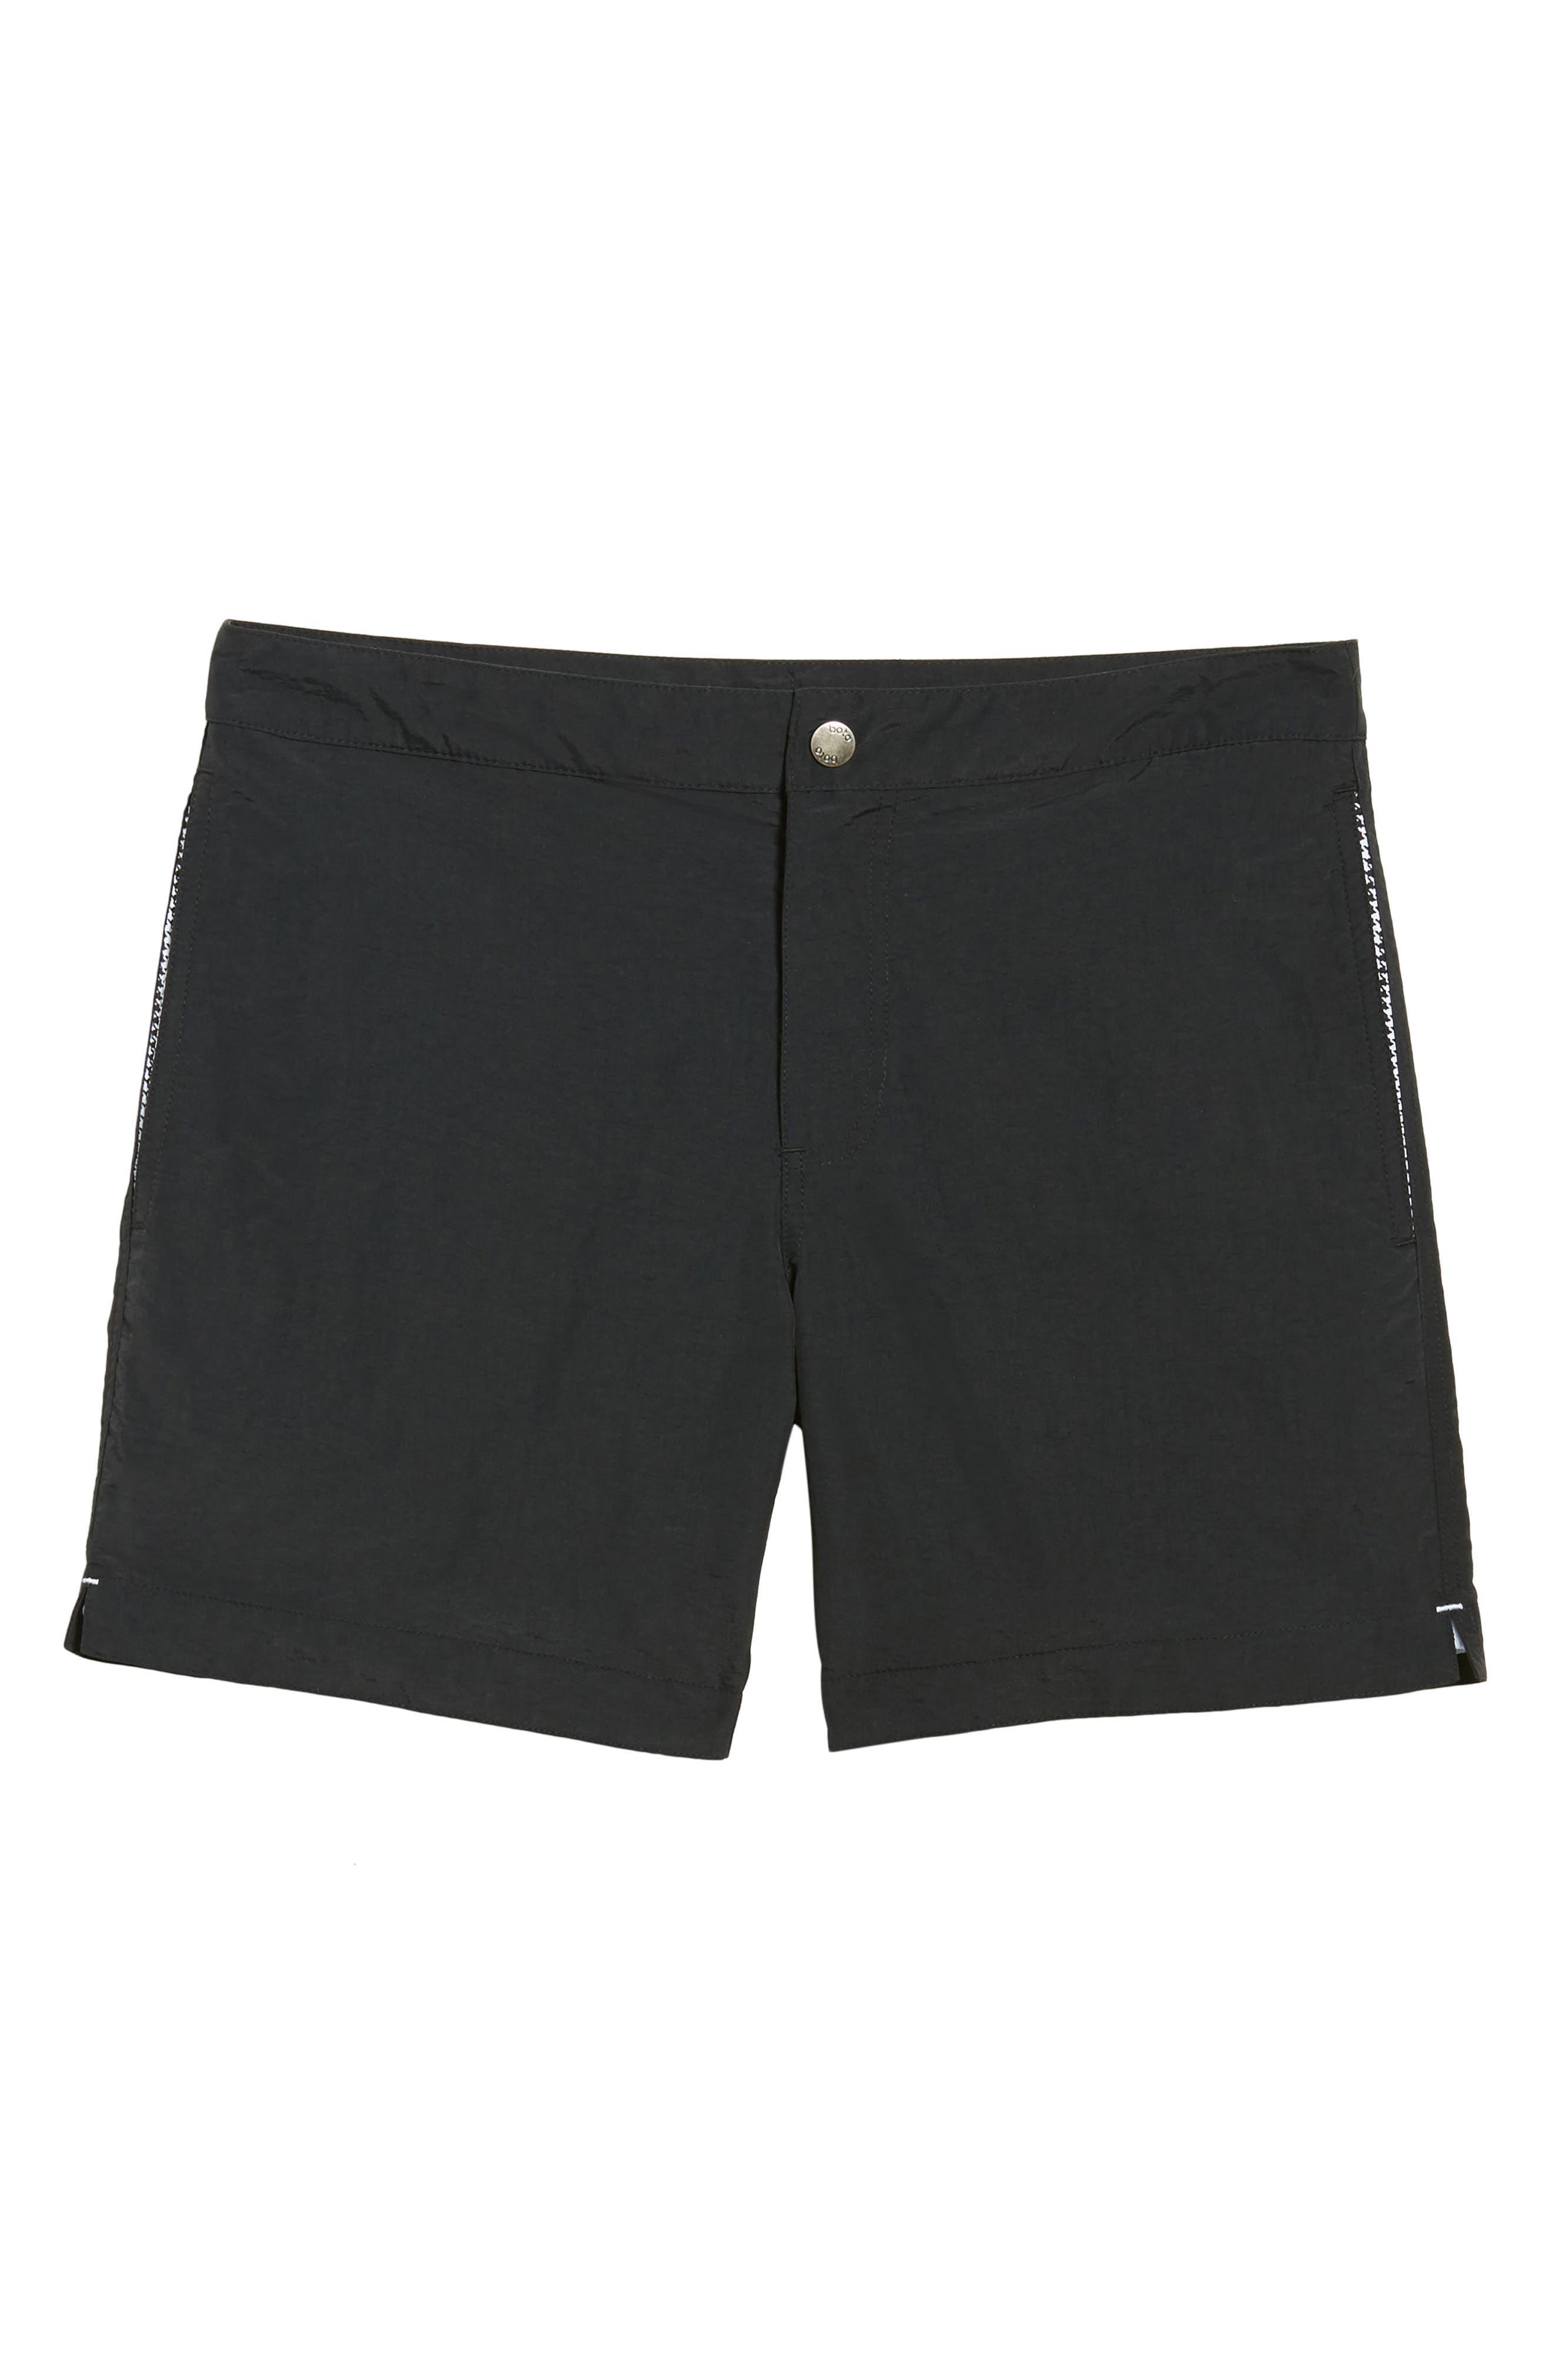 'Aruba' Tailored Fit Swim Trunks,                             Alternate thumbnail 6, color,                             Midnight Black Solid